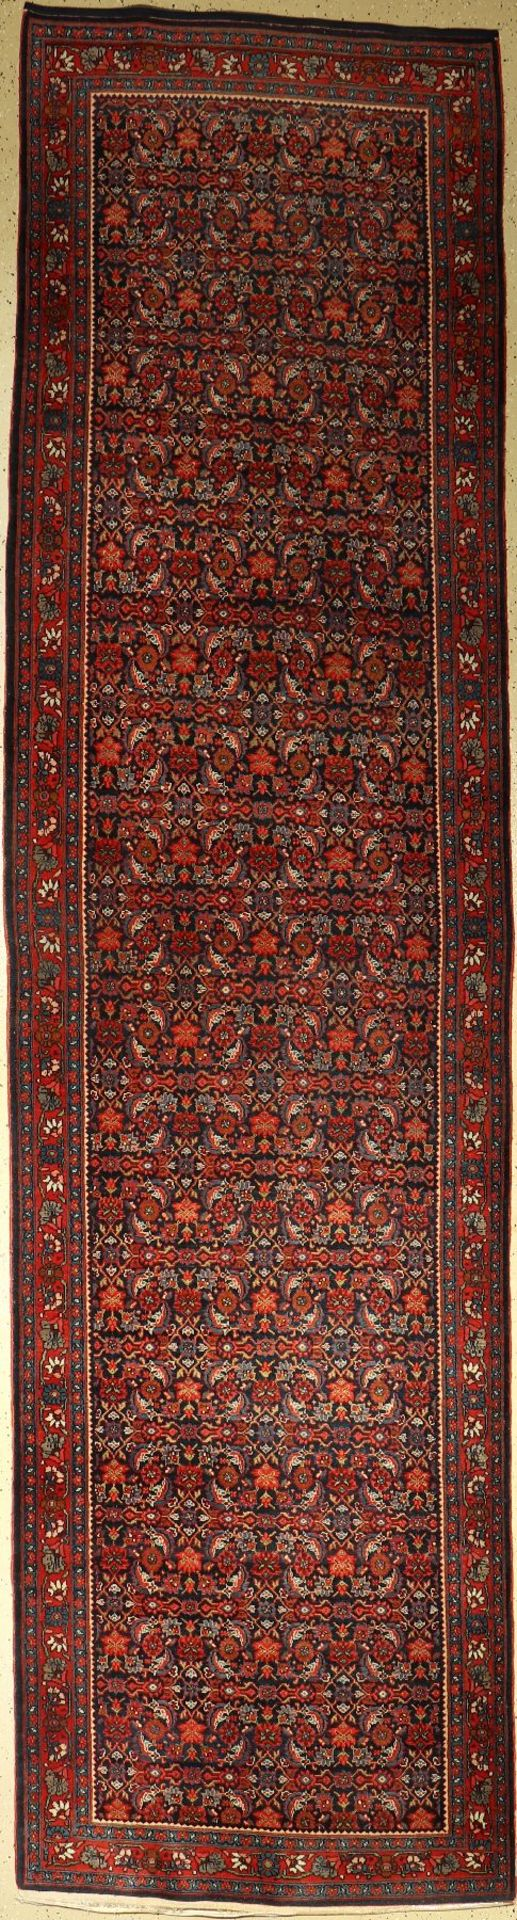 Bidjar alt (Galerie), Persien, um 1930, Korkwolle, ca. 450 x 115 cm, EHZ: 2-3